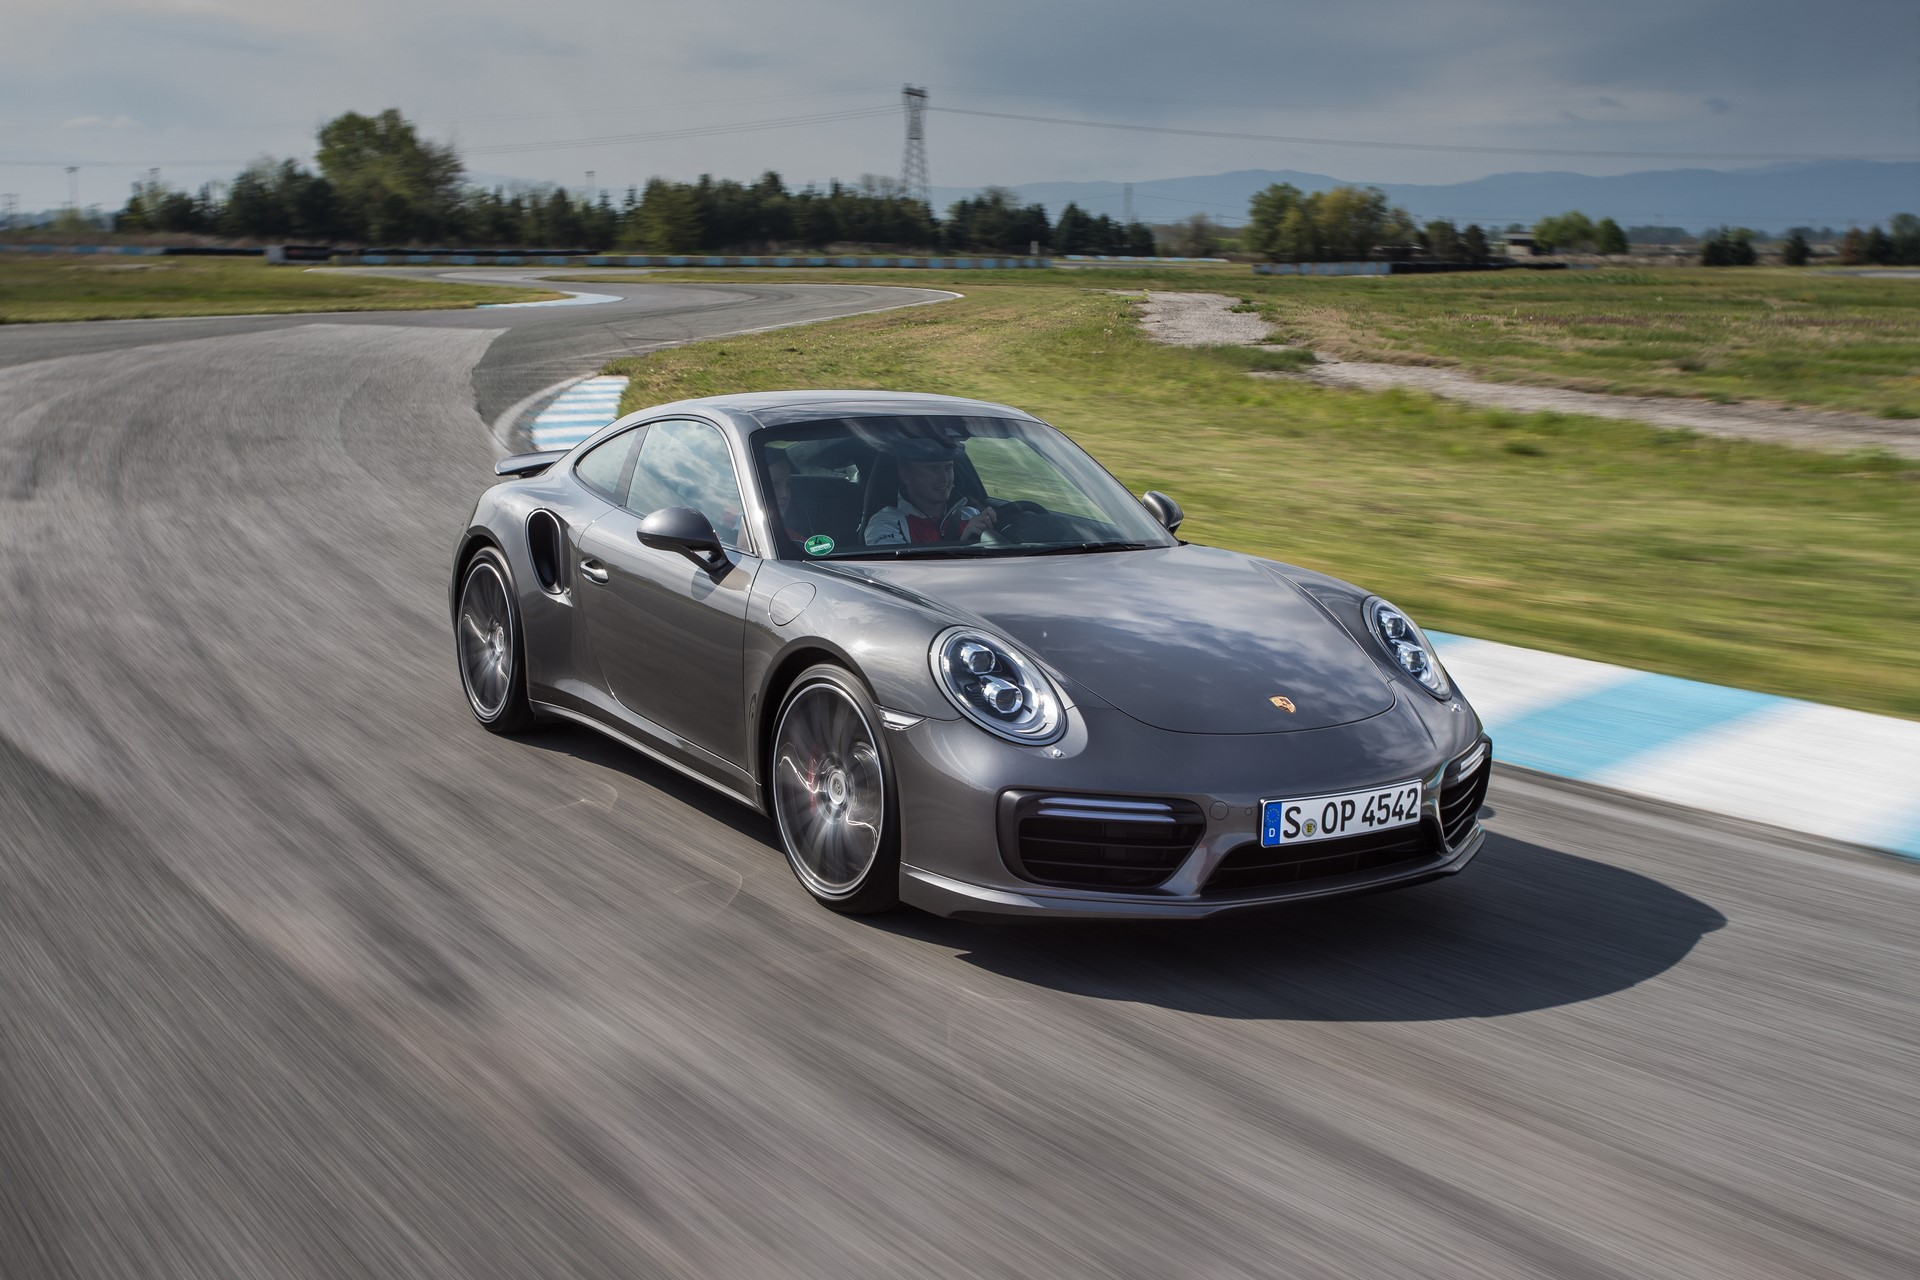 Porsche Driving Experience 2017 Serres (21)